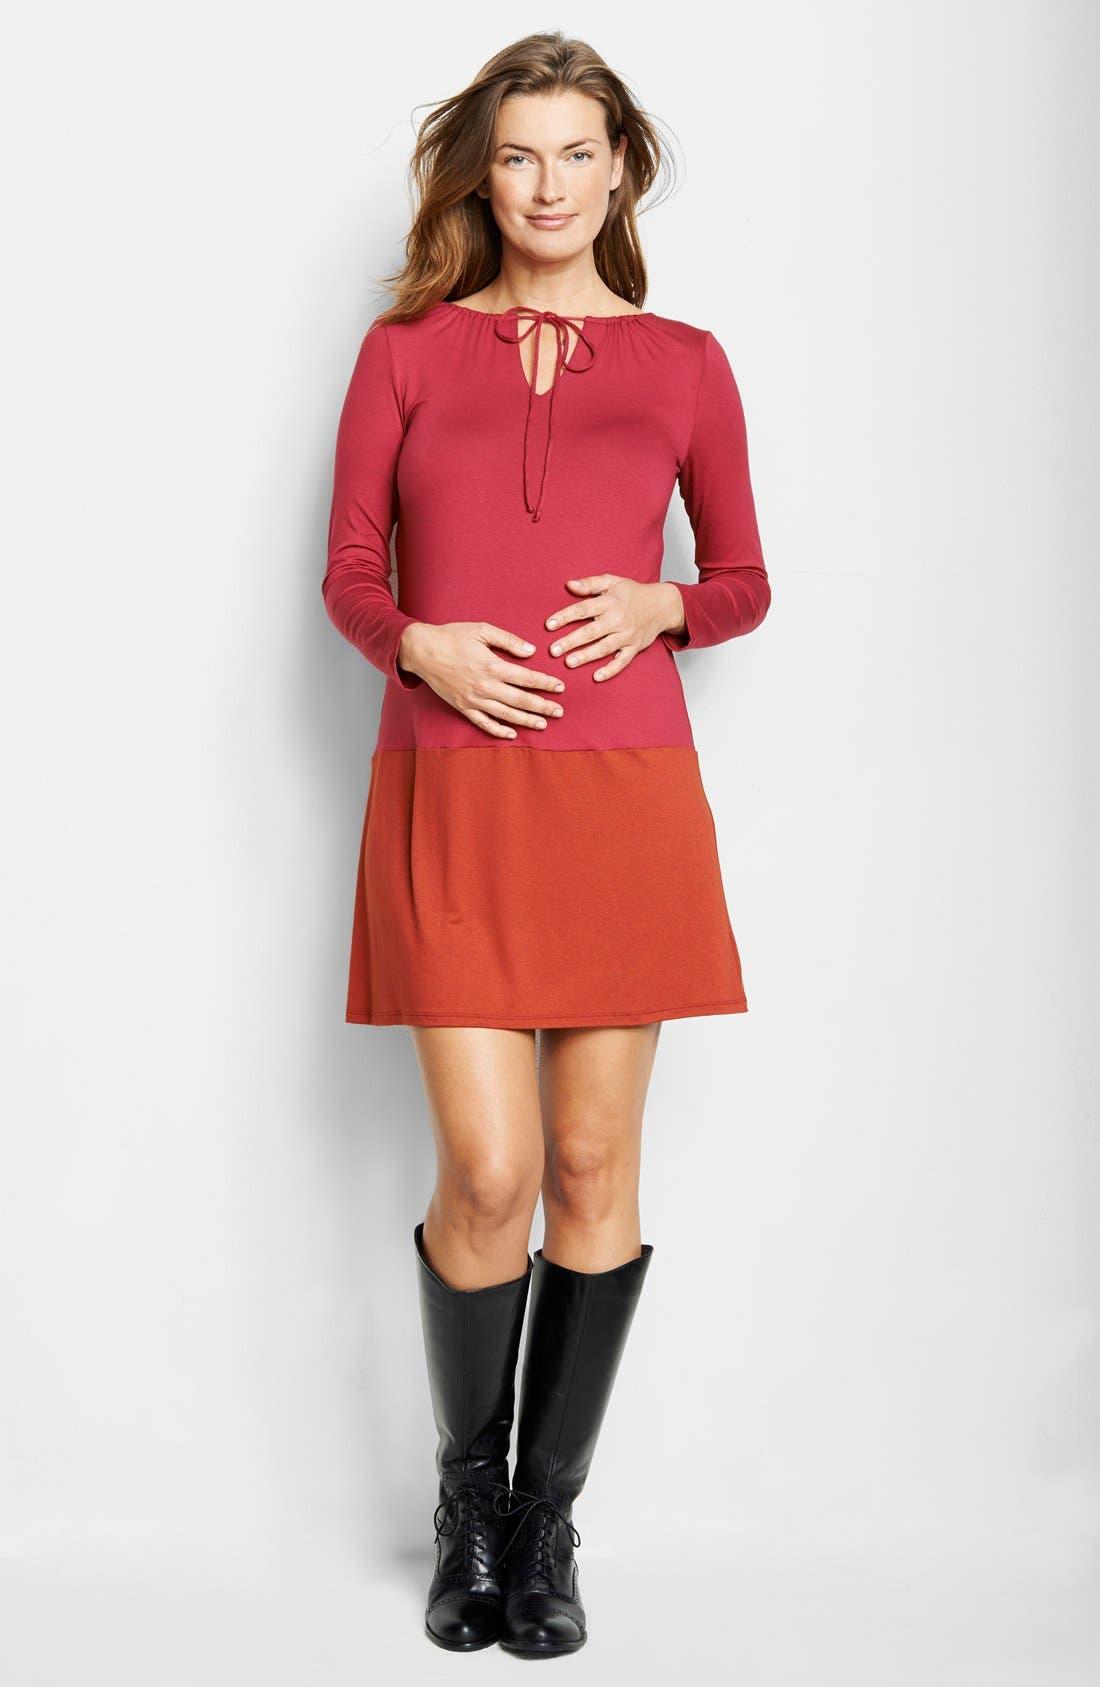 Keyhole Maternity Dress,                         Main,                         color, BURGUNDY/ RUST